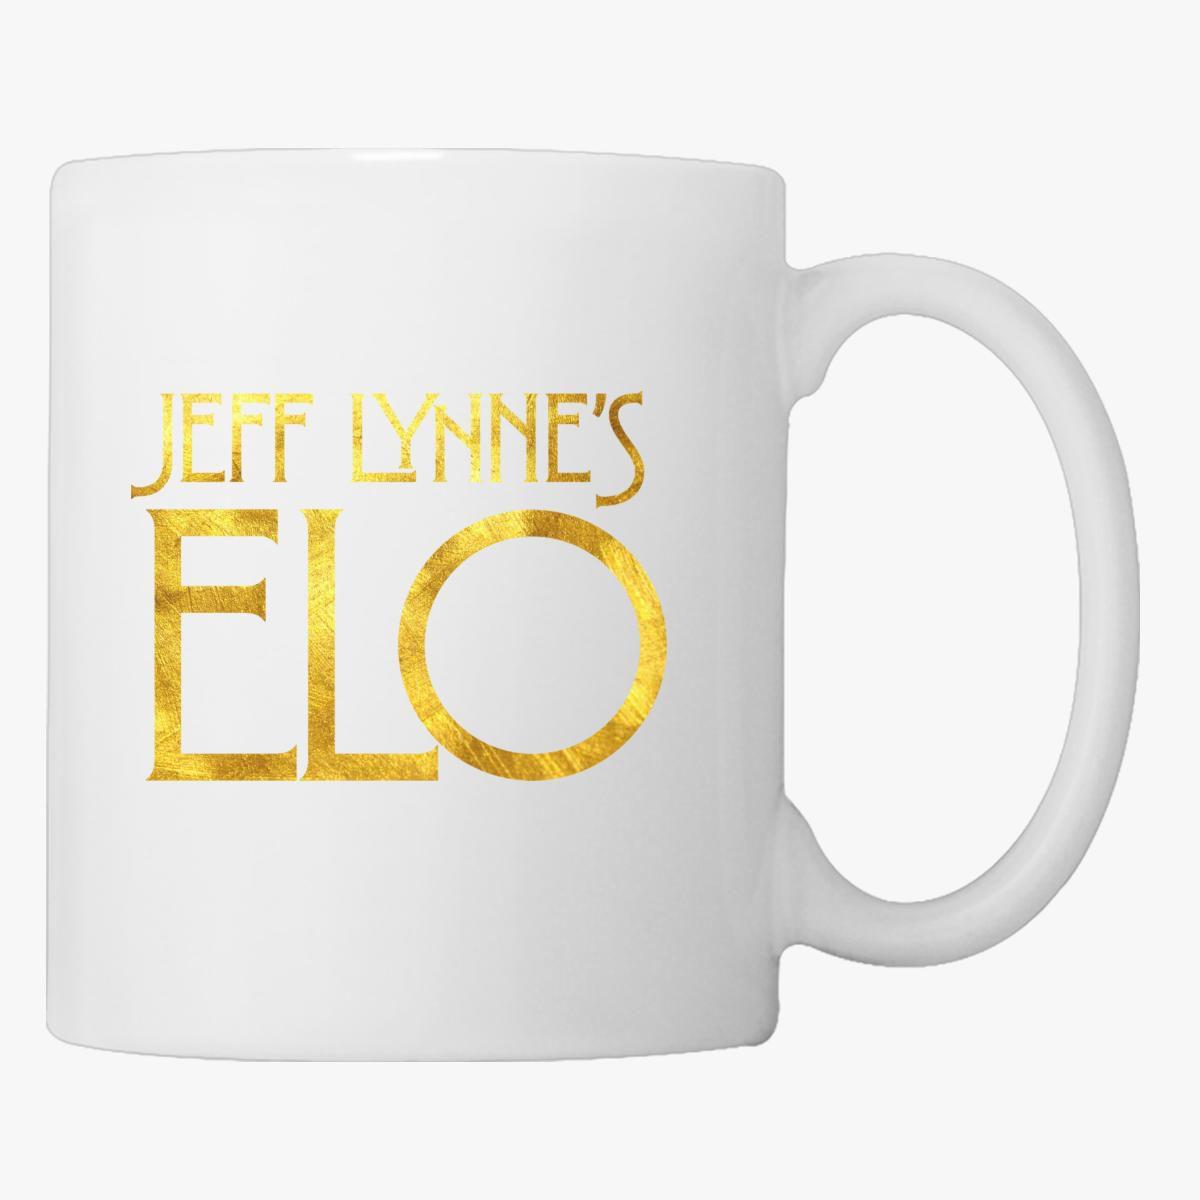 Jeff Lynne's ELO Coffee Mug - Customon